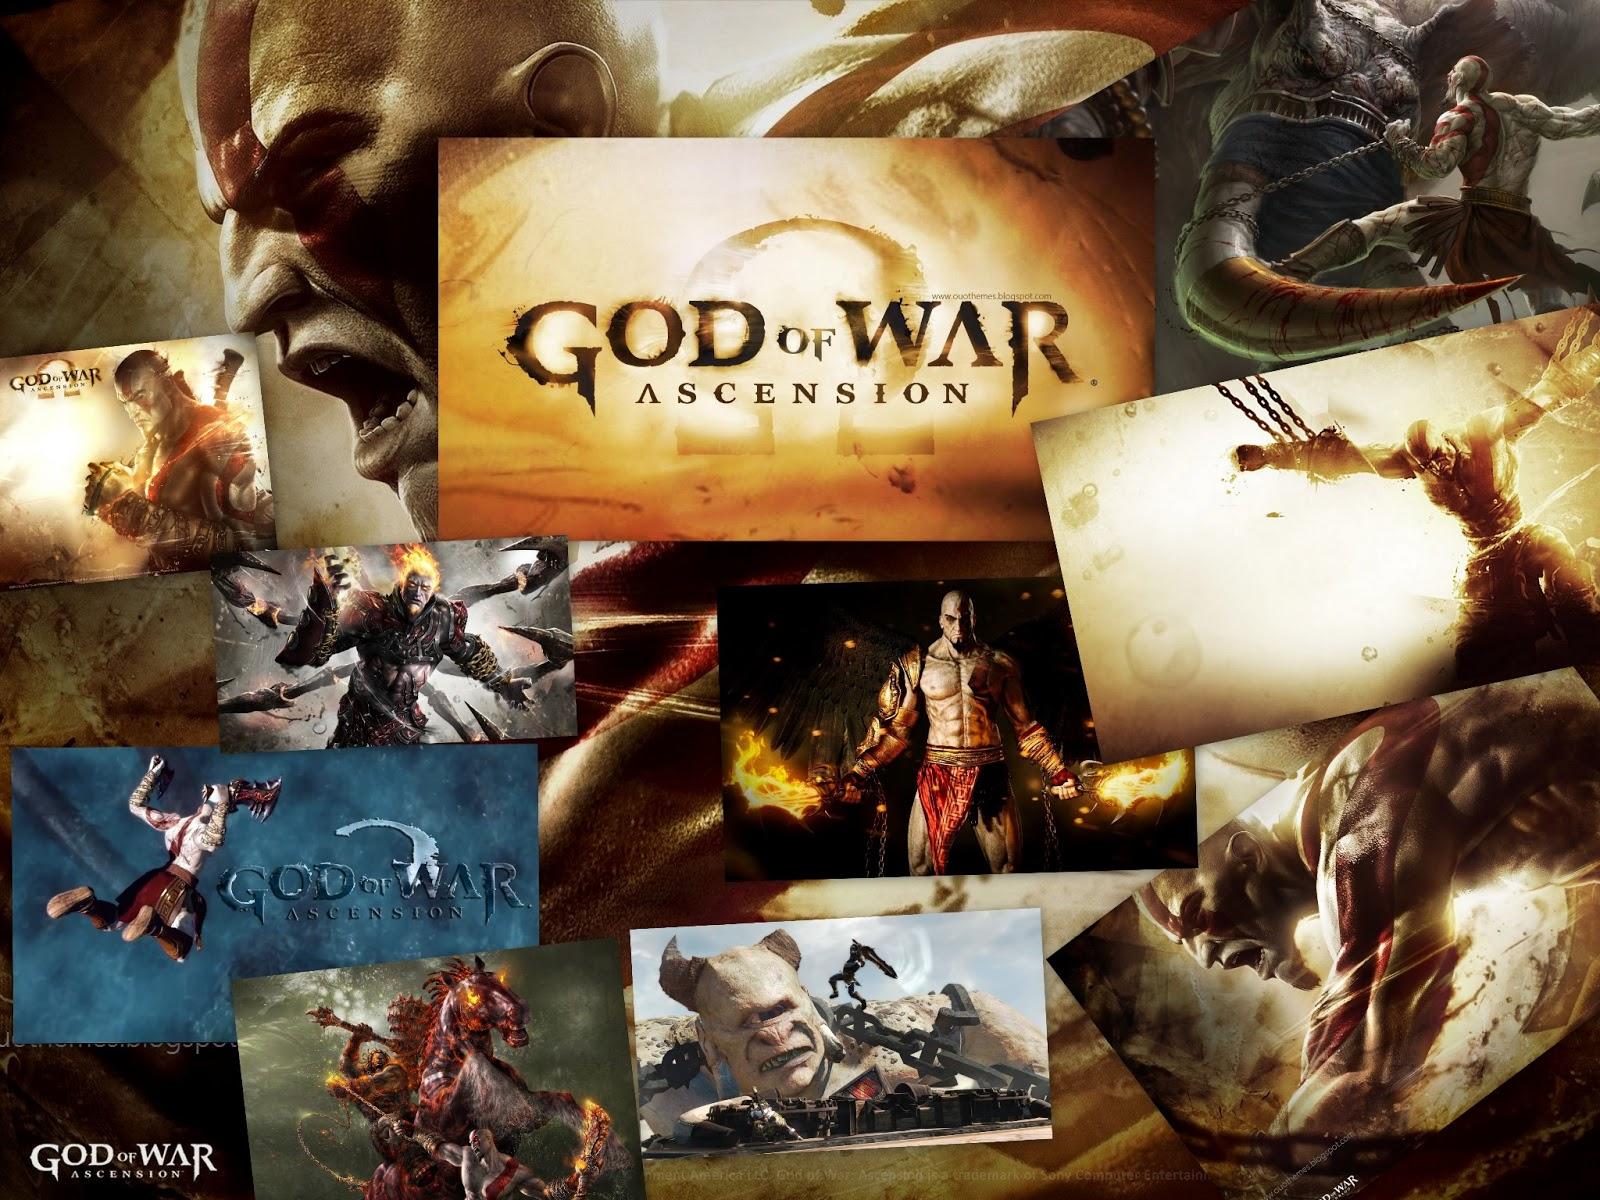 god of war game free download for windows 7 ultimate